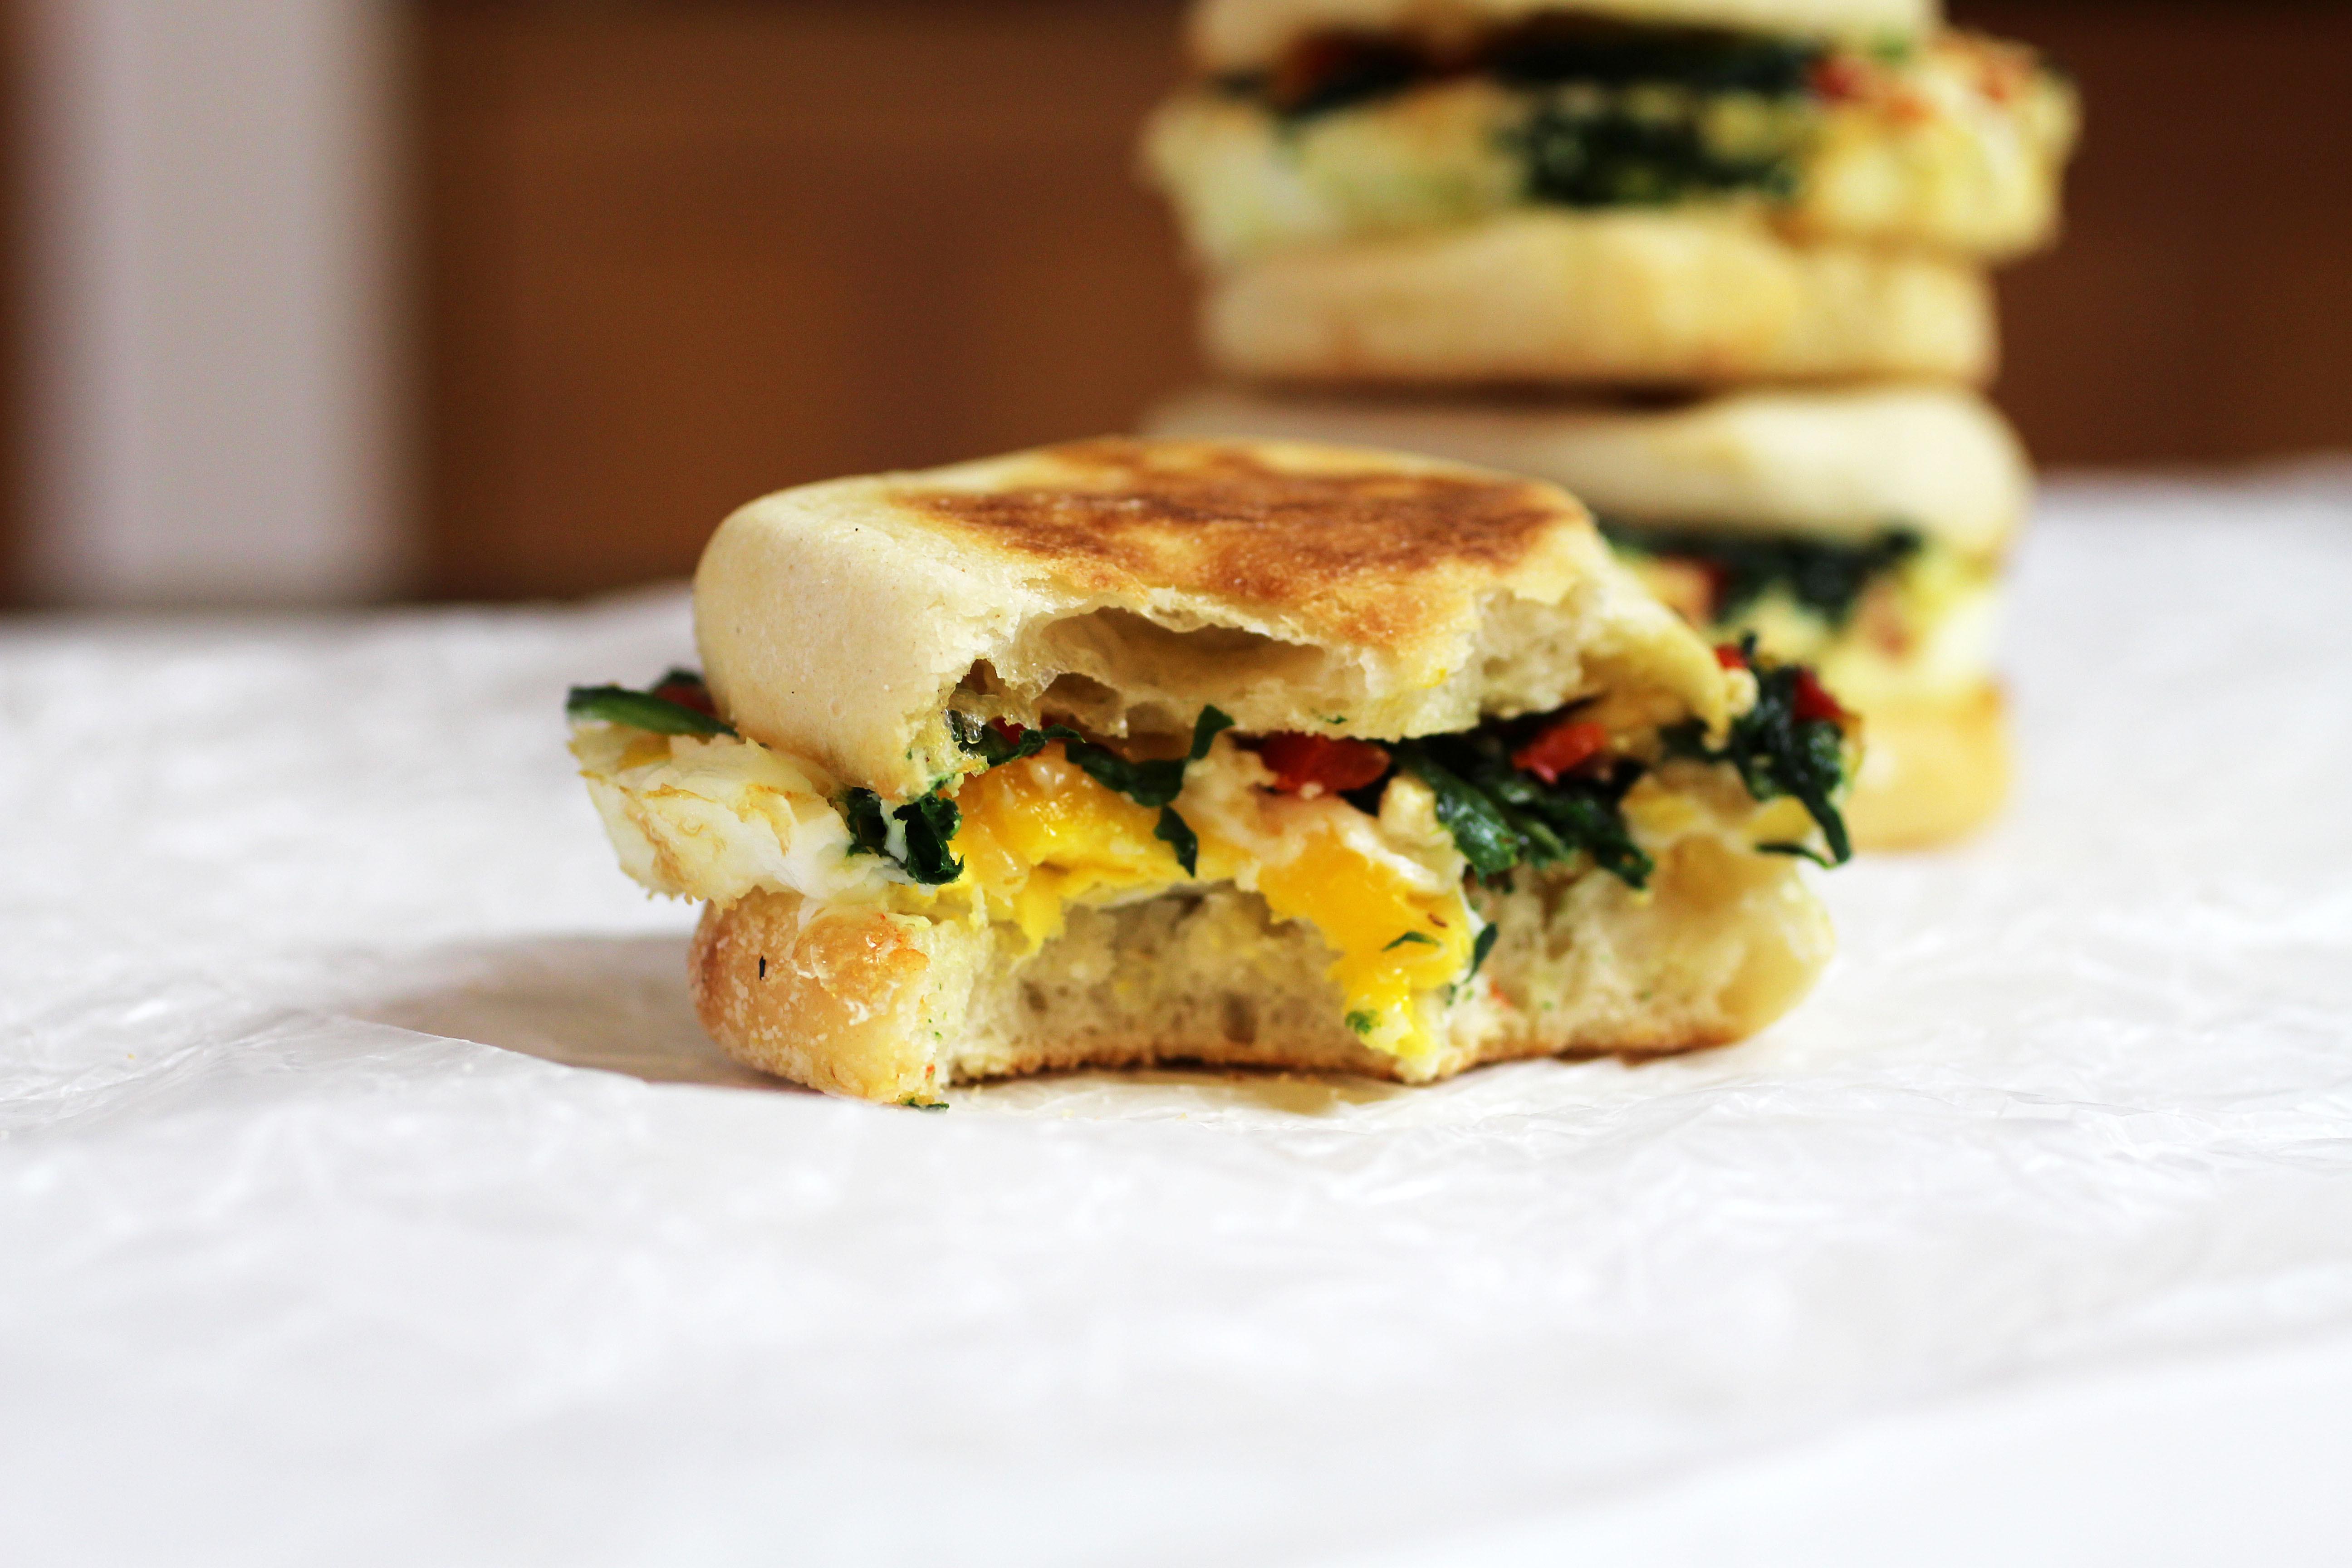 Healthy Breakfast Sandwich Ideas  5 Breakfast Sandwiches Under 400 Calories